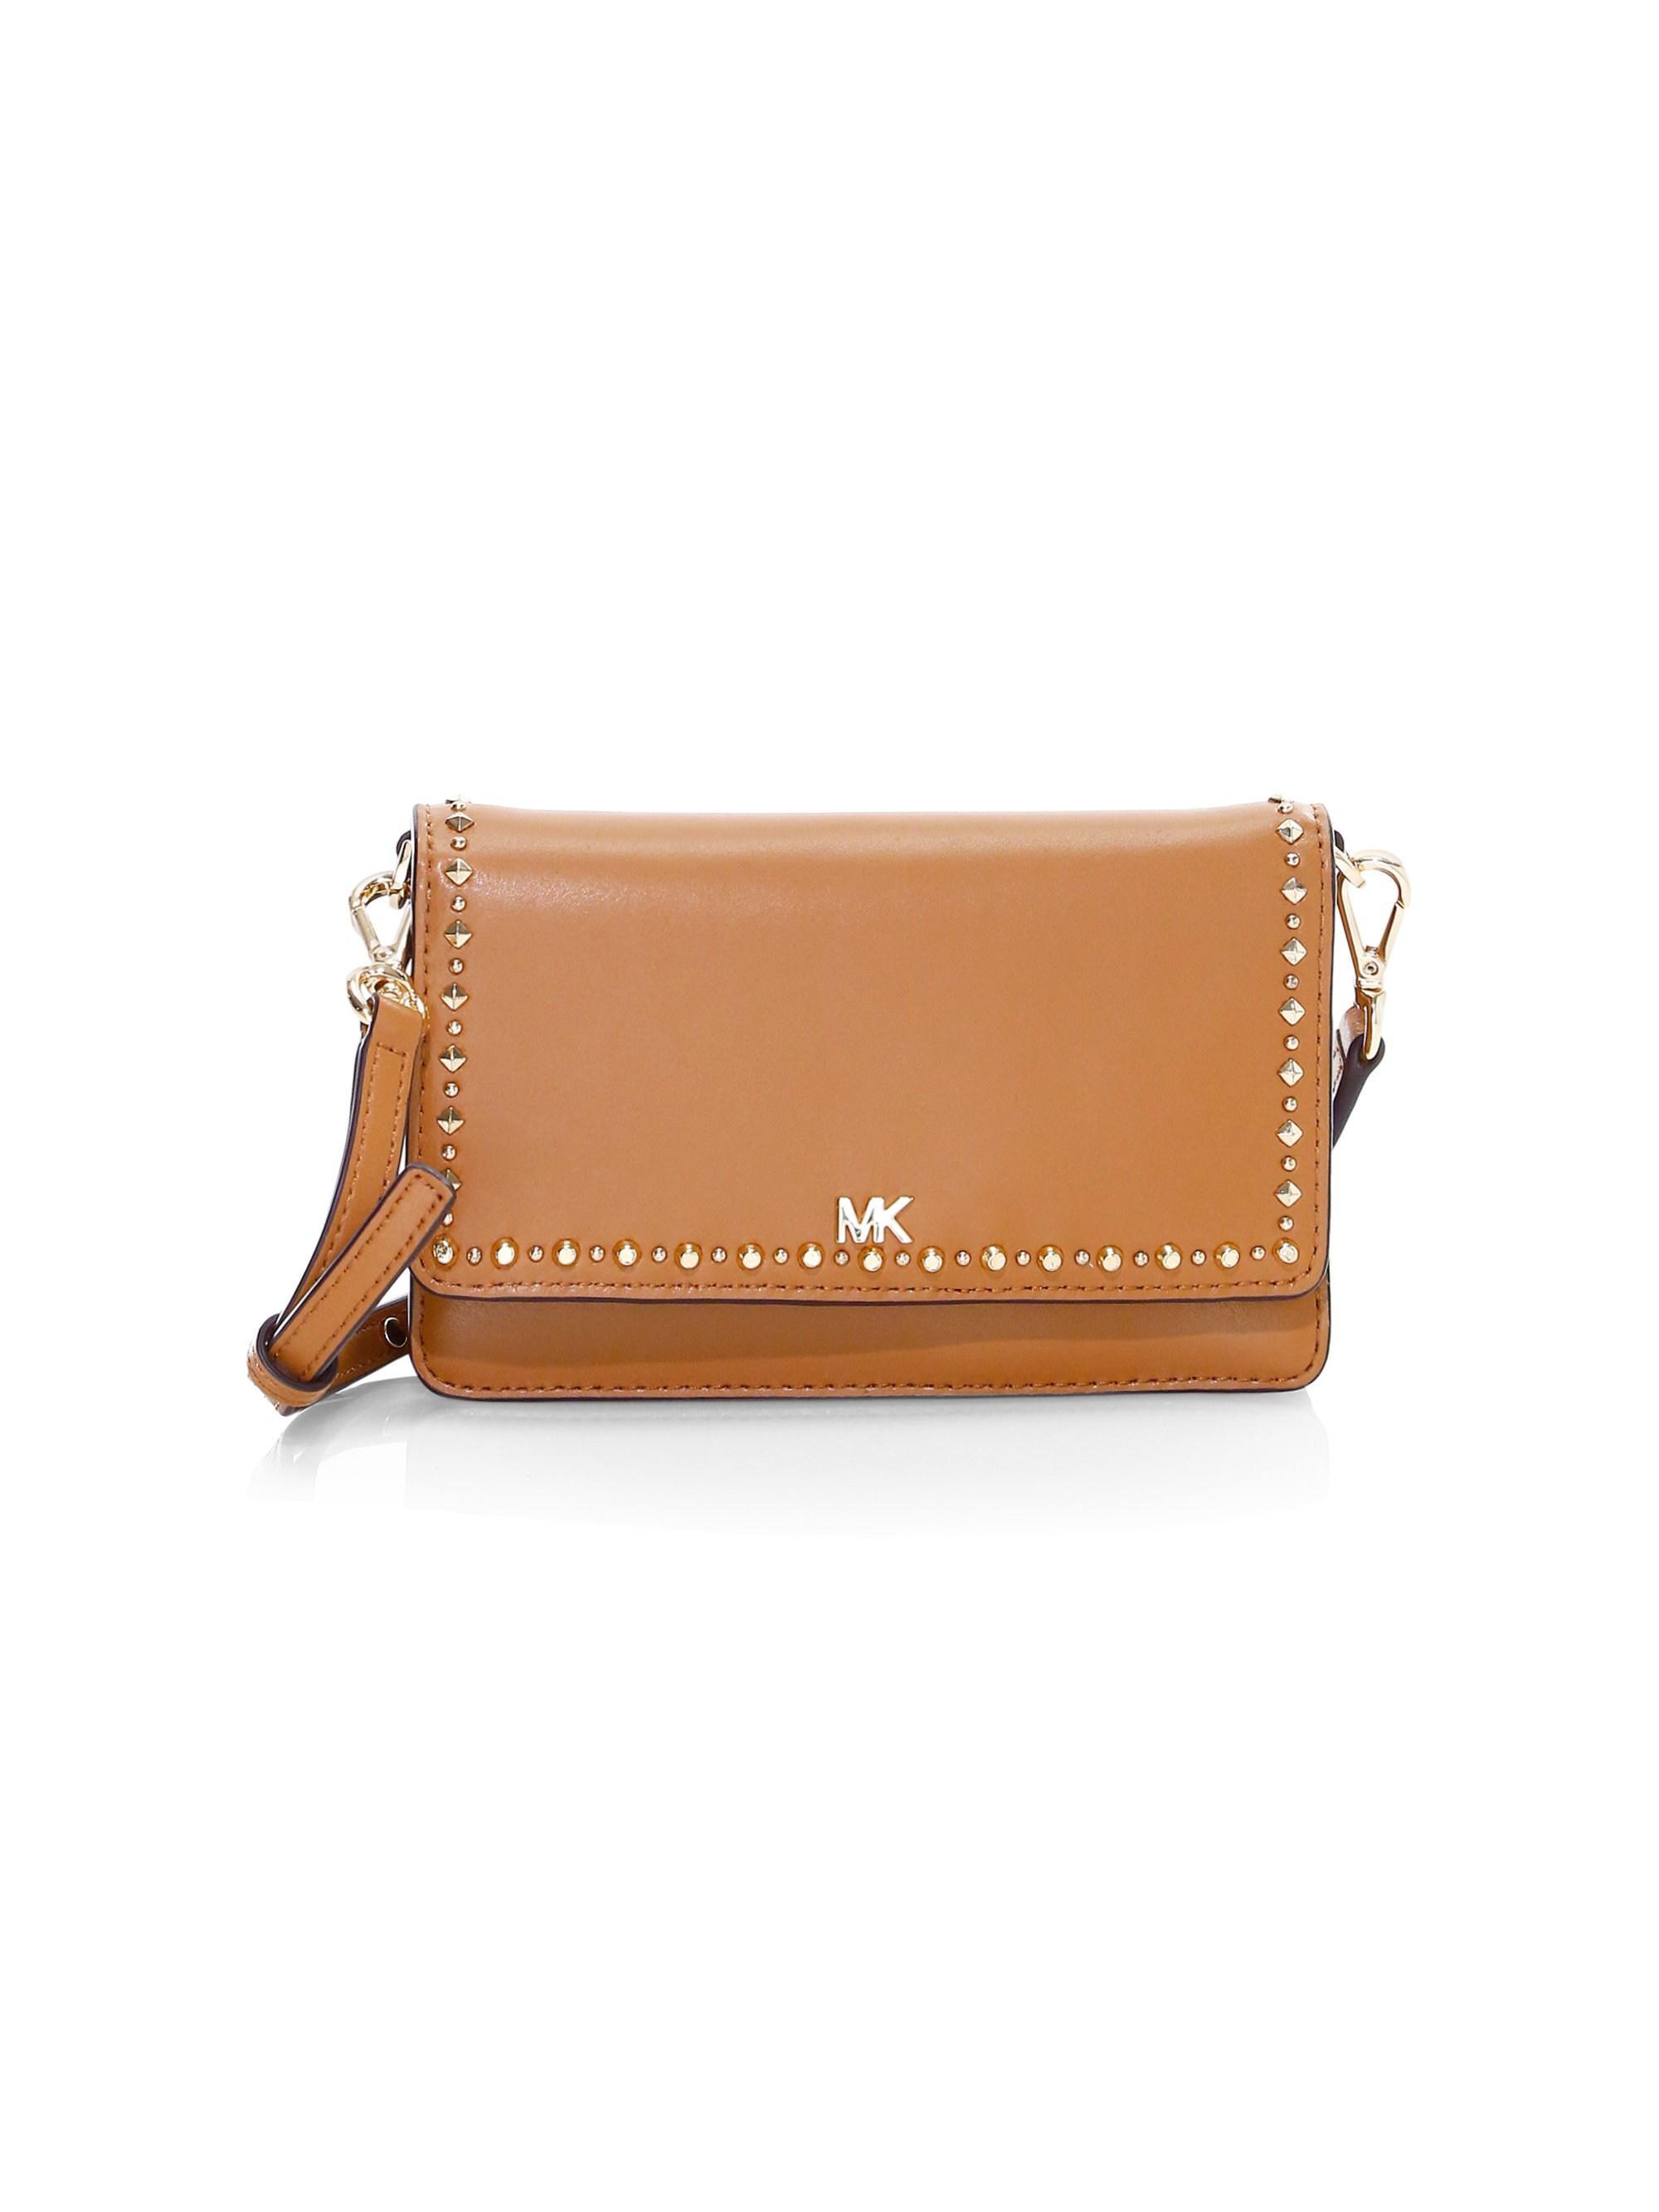 890535d577f191 MICHAEL Michael Kors Women's Stud-trim Goldtone Logo Leather ...